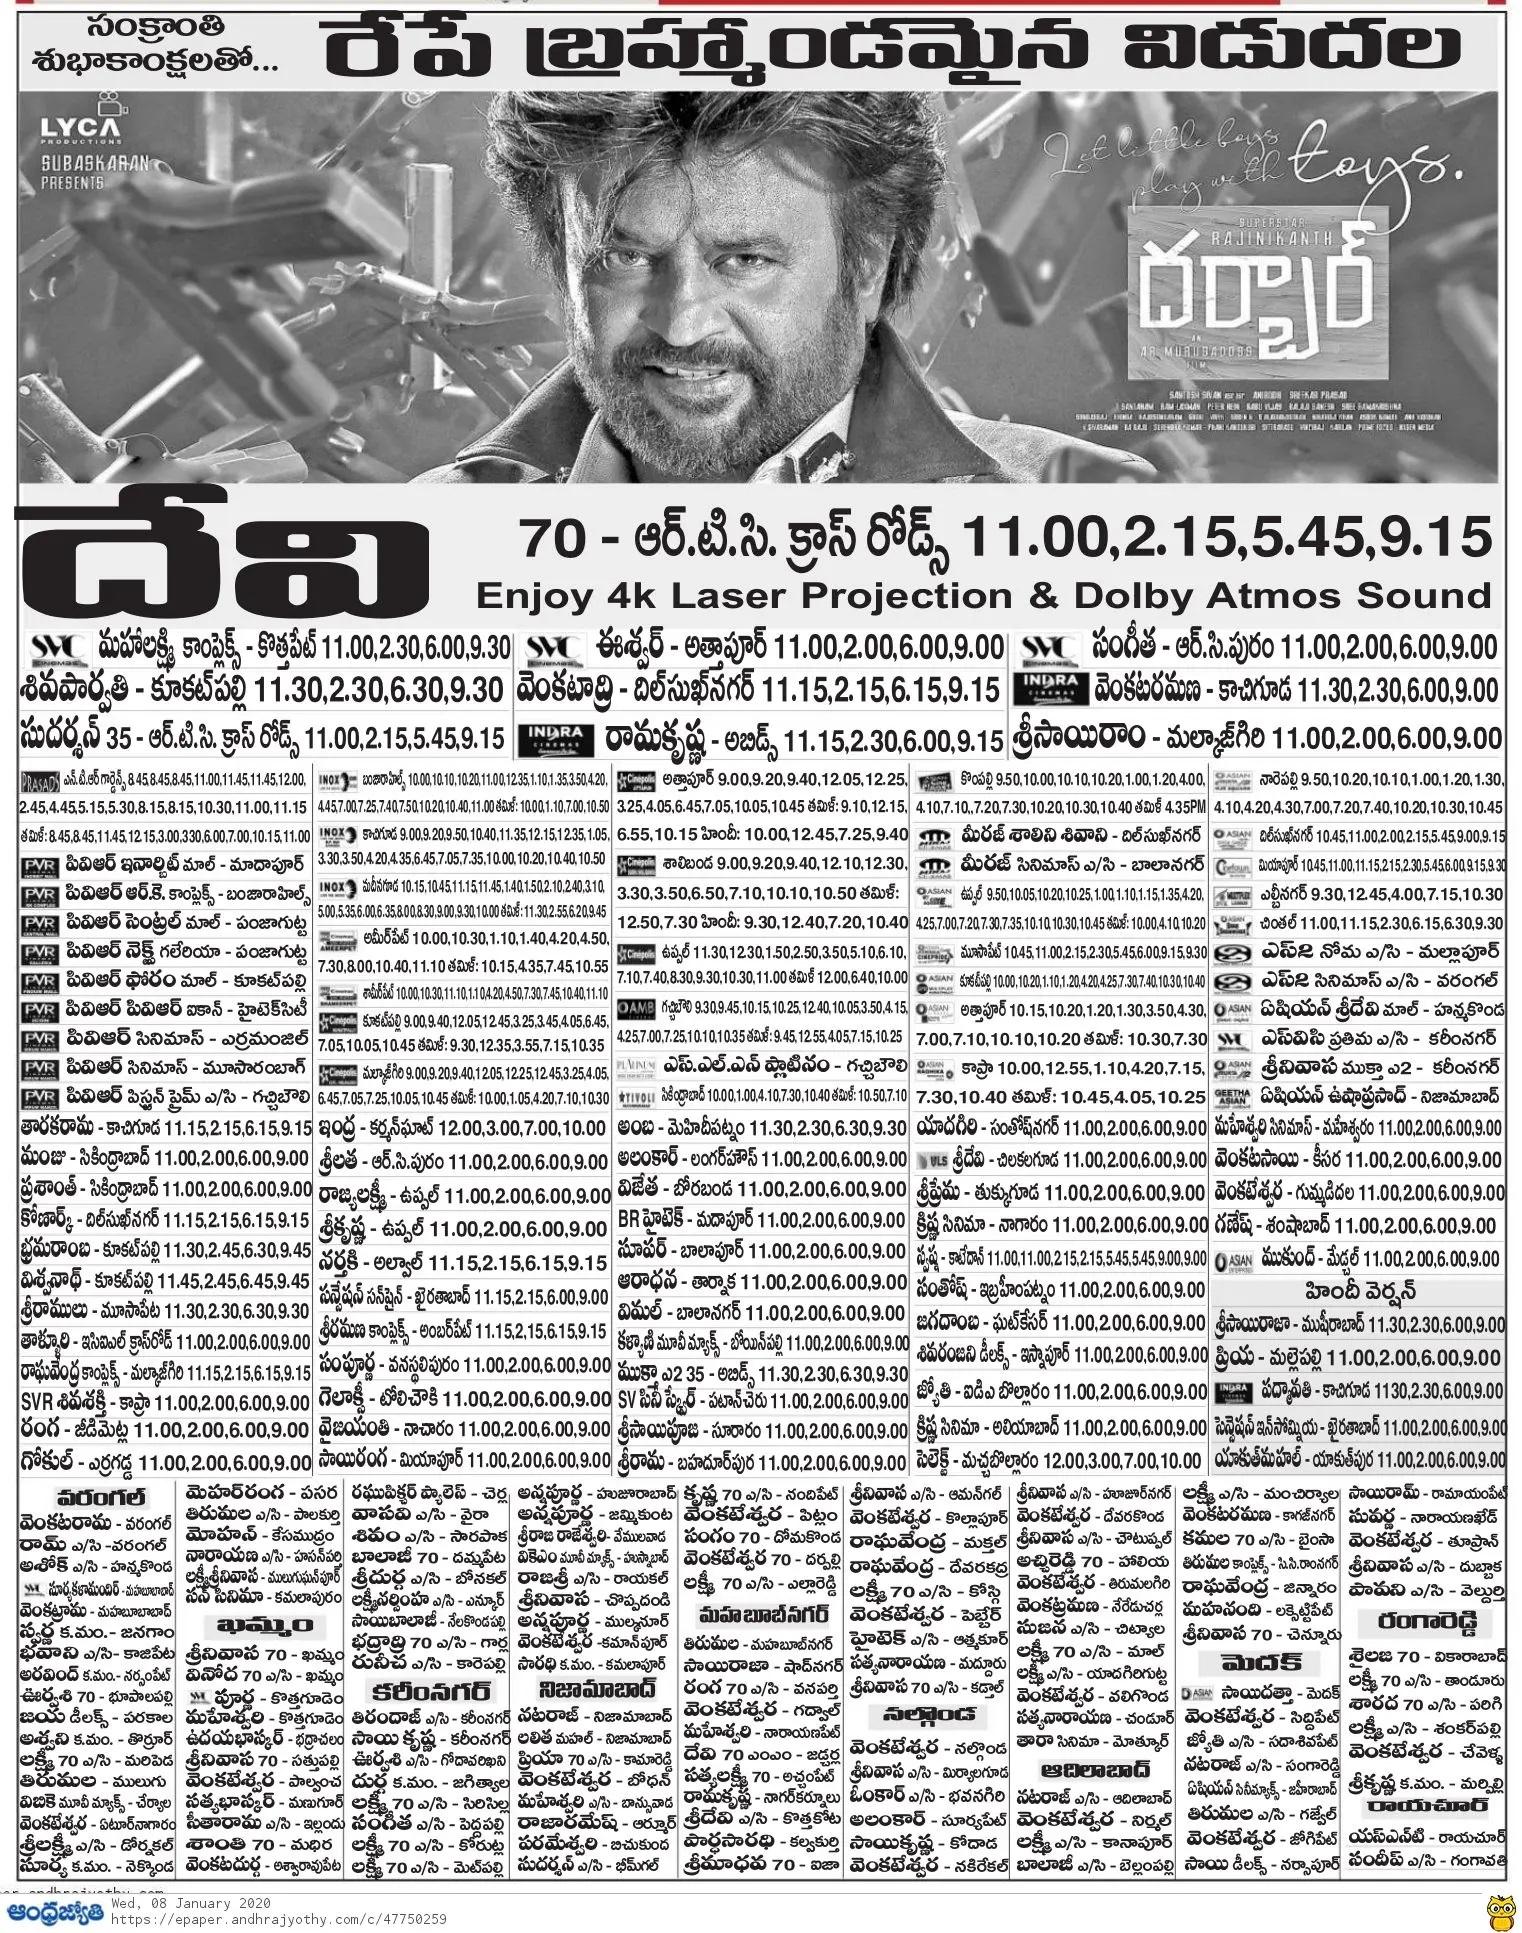 2020 Sankranthi Release: Darbar Hyderabad And Nizam Theaters List